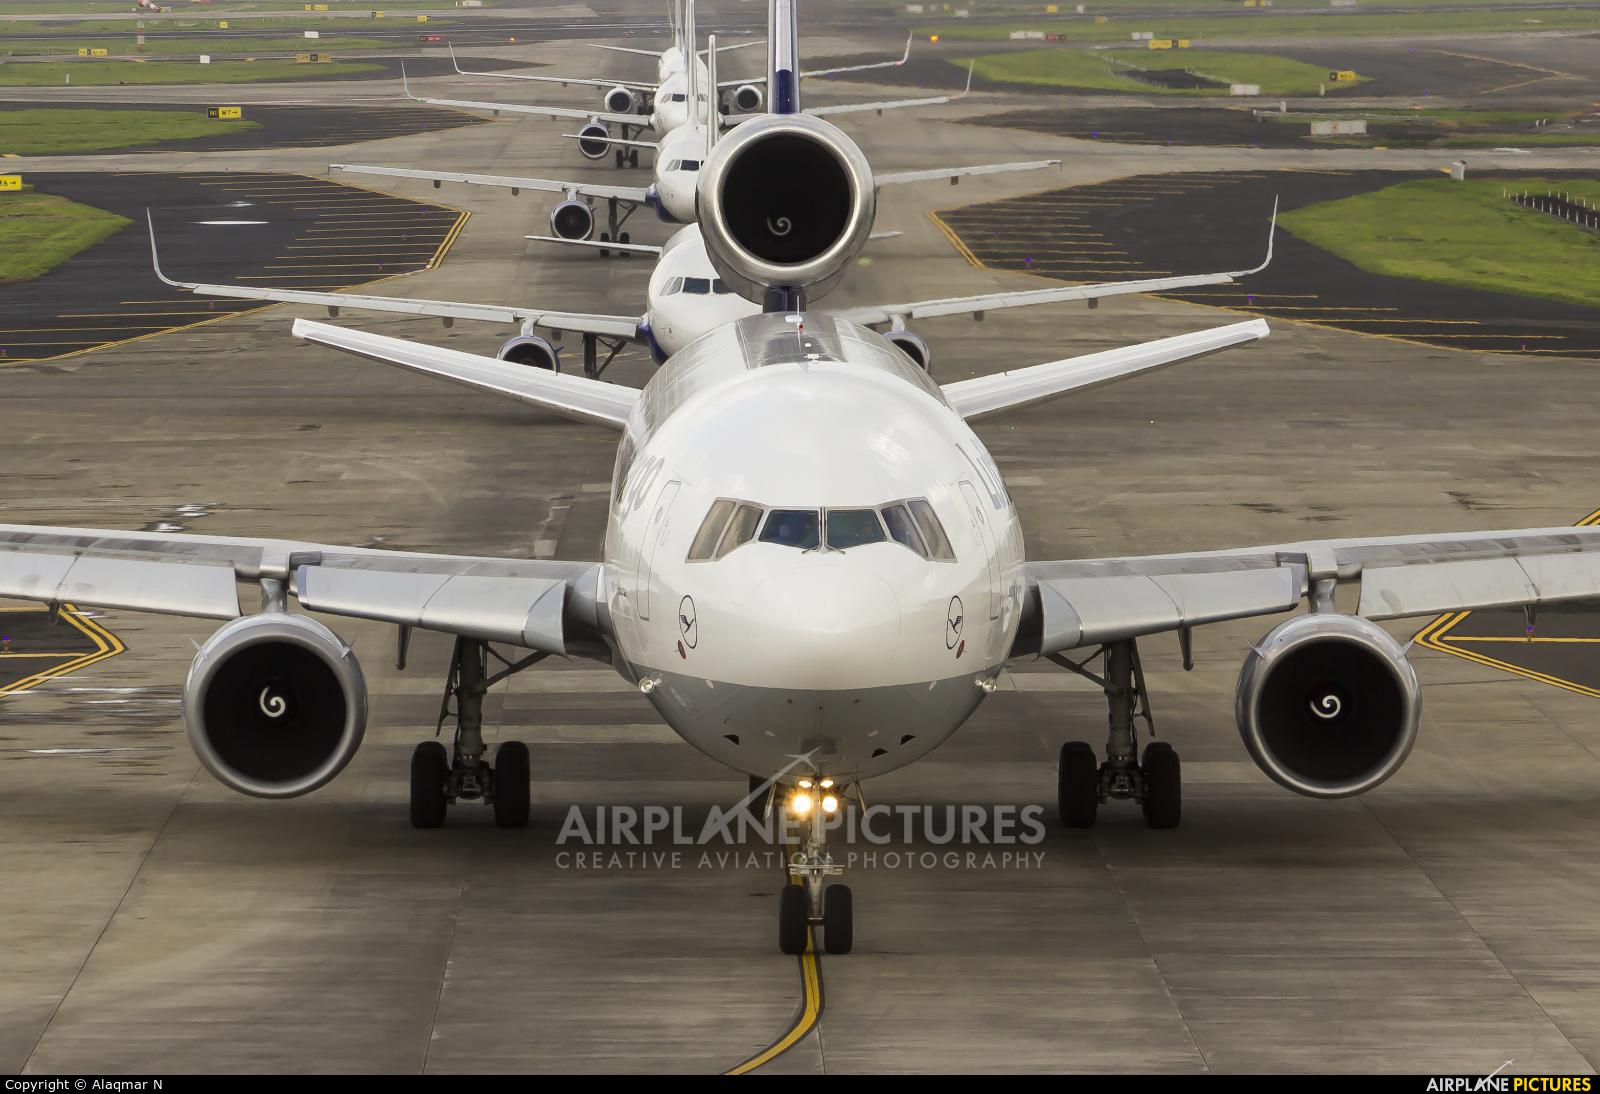 Lufthansa Cargo D-ALCN aircraft at Mumbai - Chhatrapati Shivaji Intl